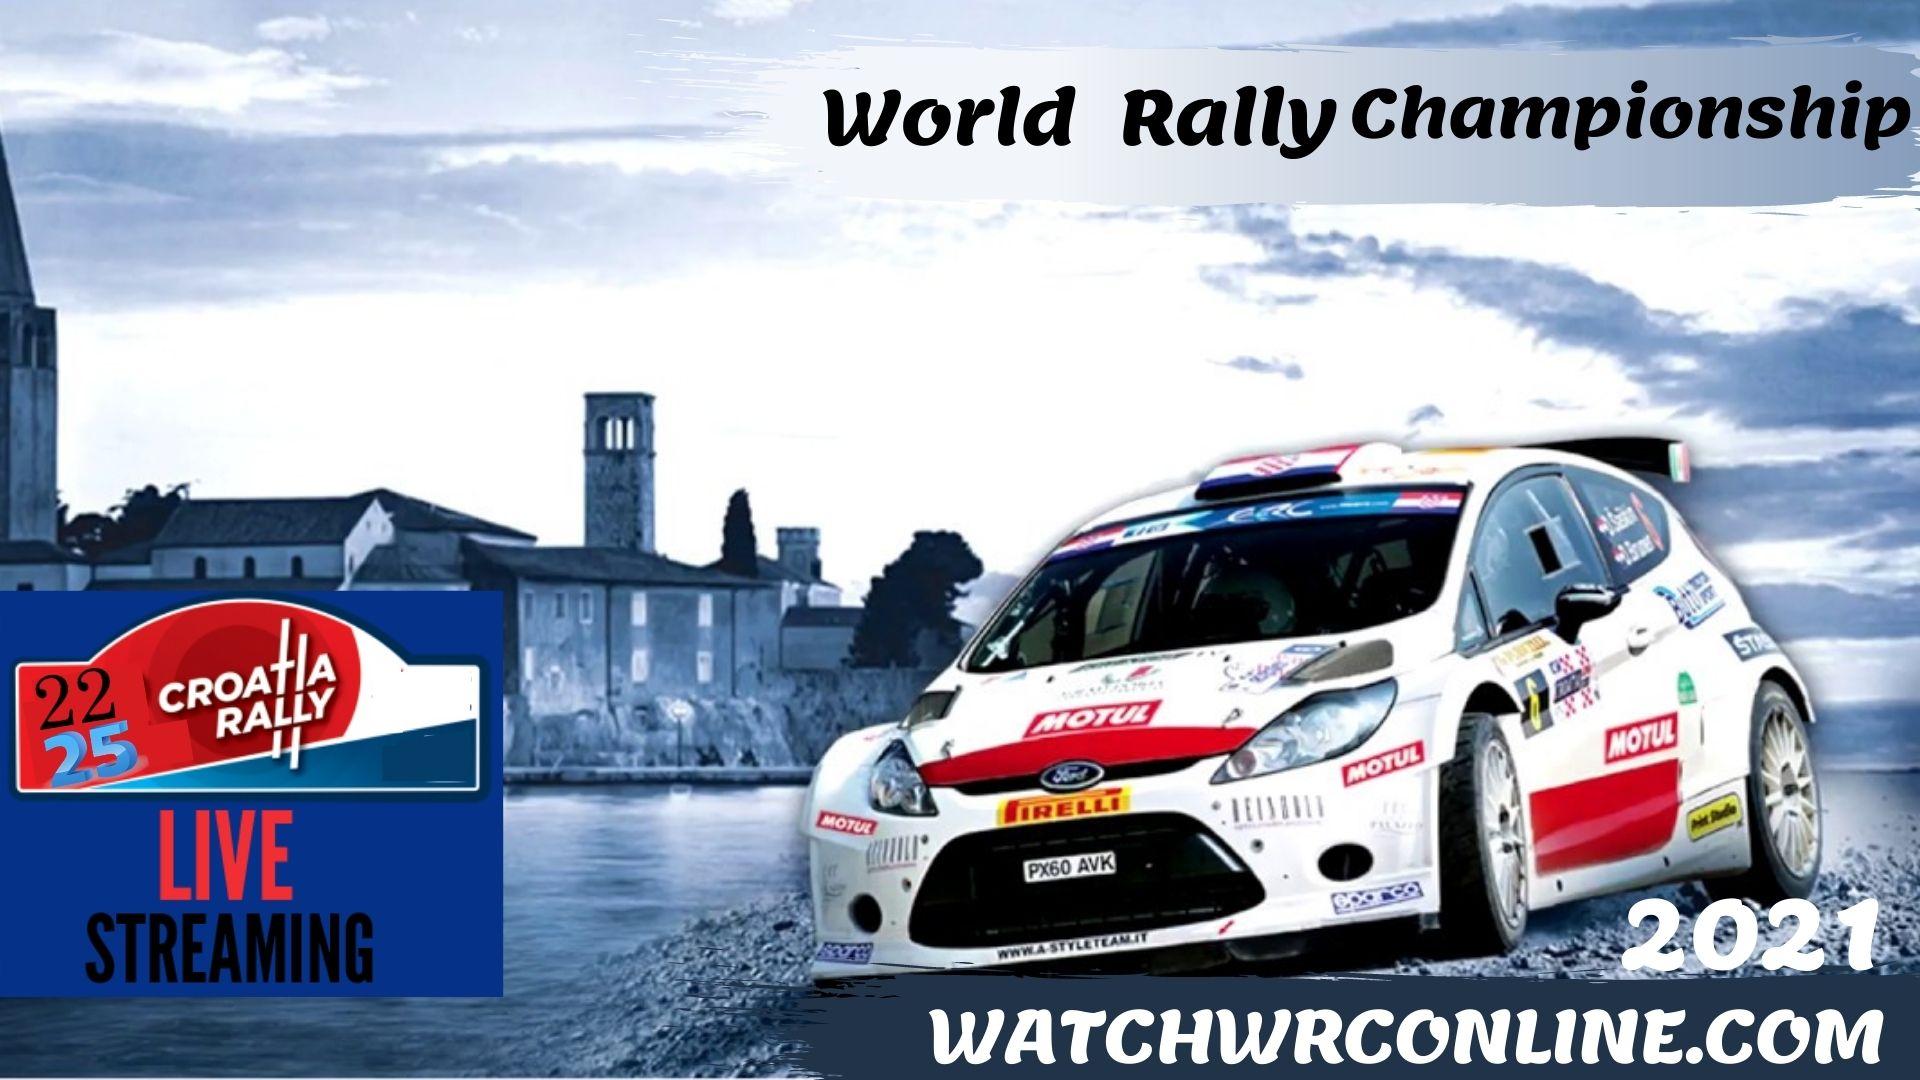 Croatia Rally WRC Live Stream